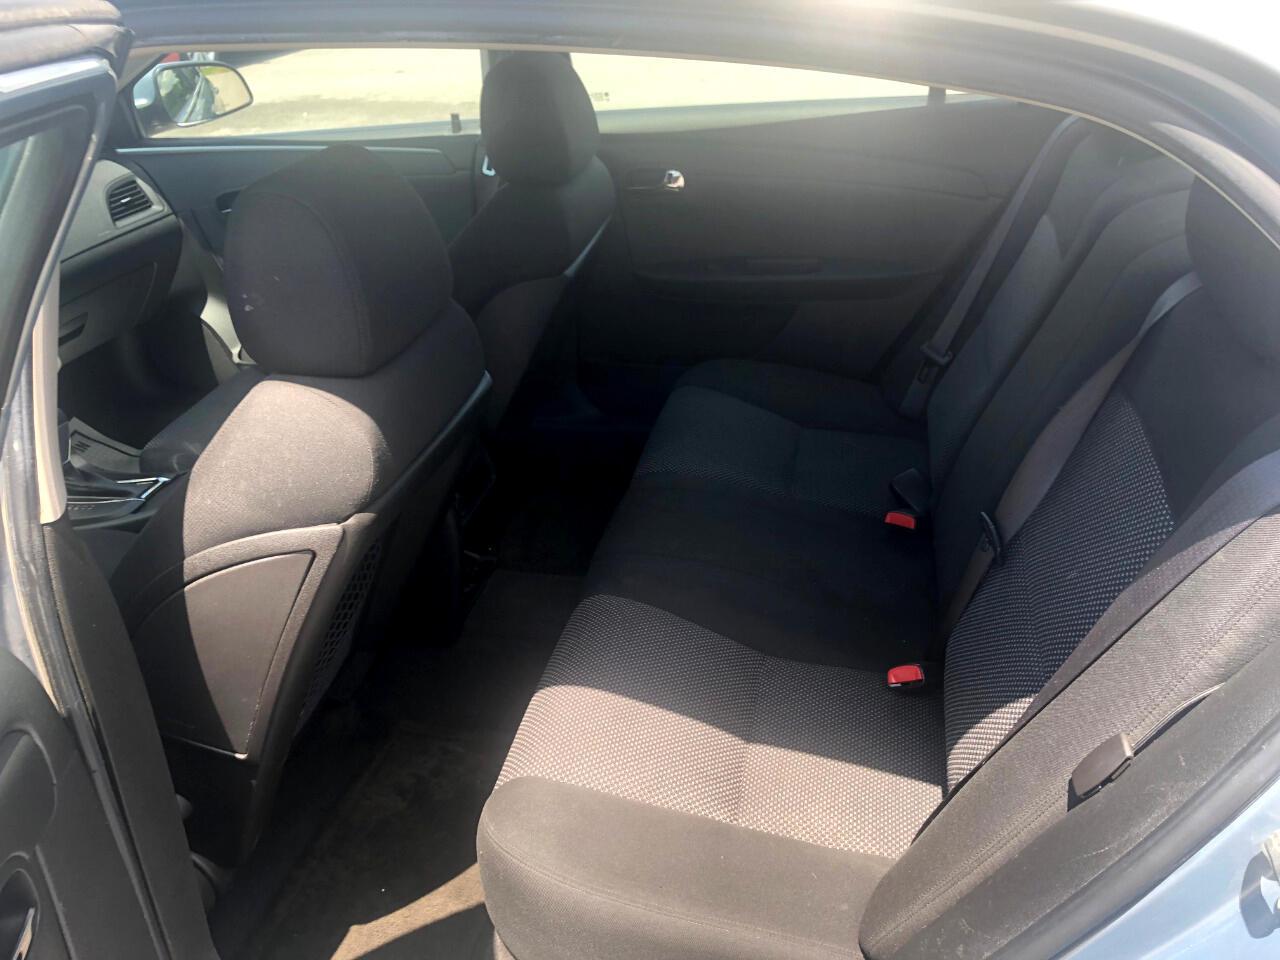 2009 Chevrolet Malibu 4dr Sdn LT w/1LT